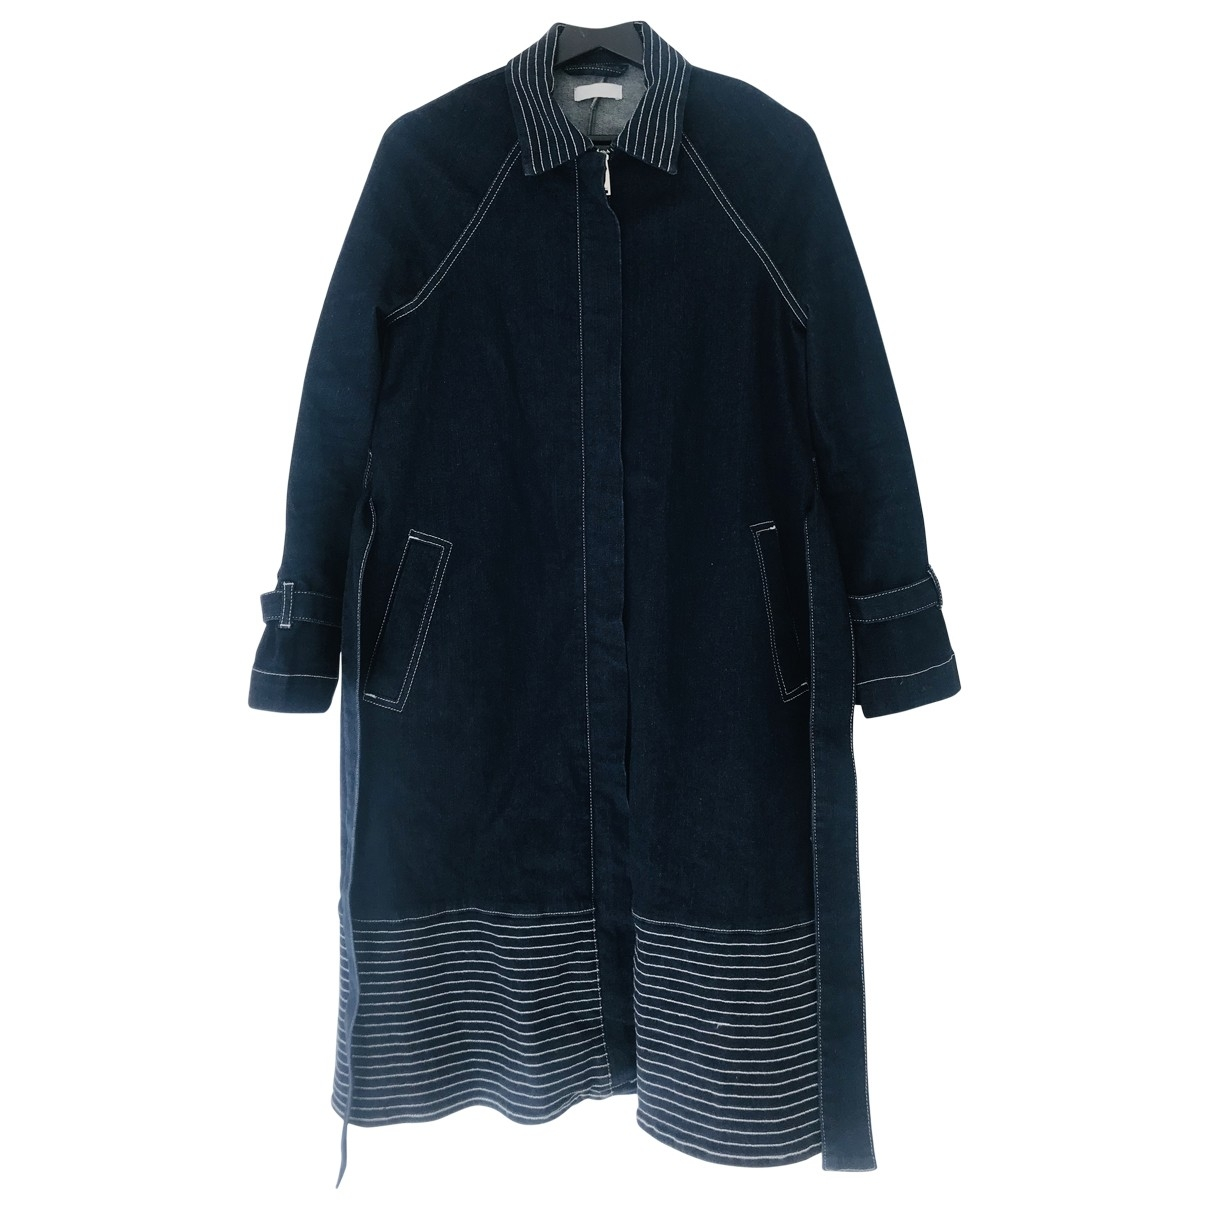 2nd Day \N Navy Denim - Jeans jacket for Women 36 FR